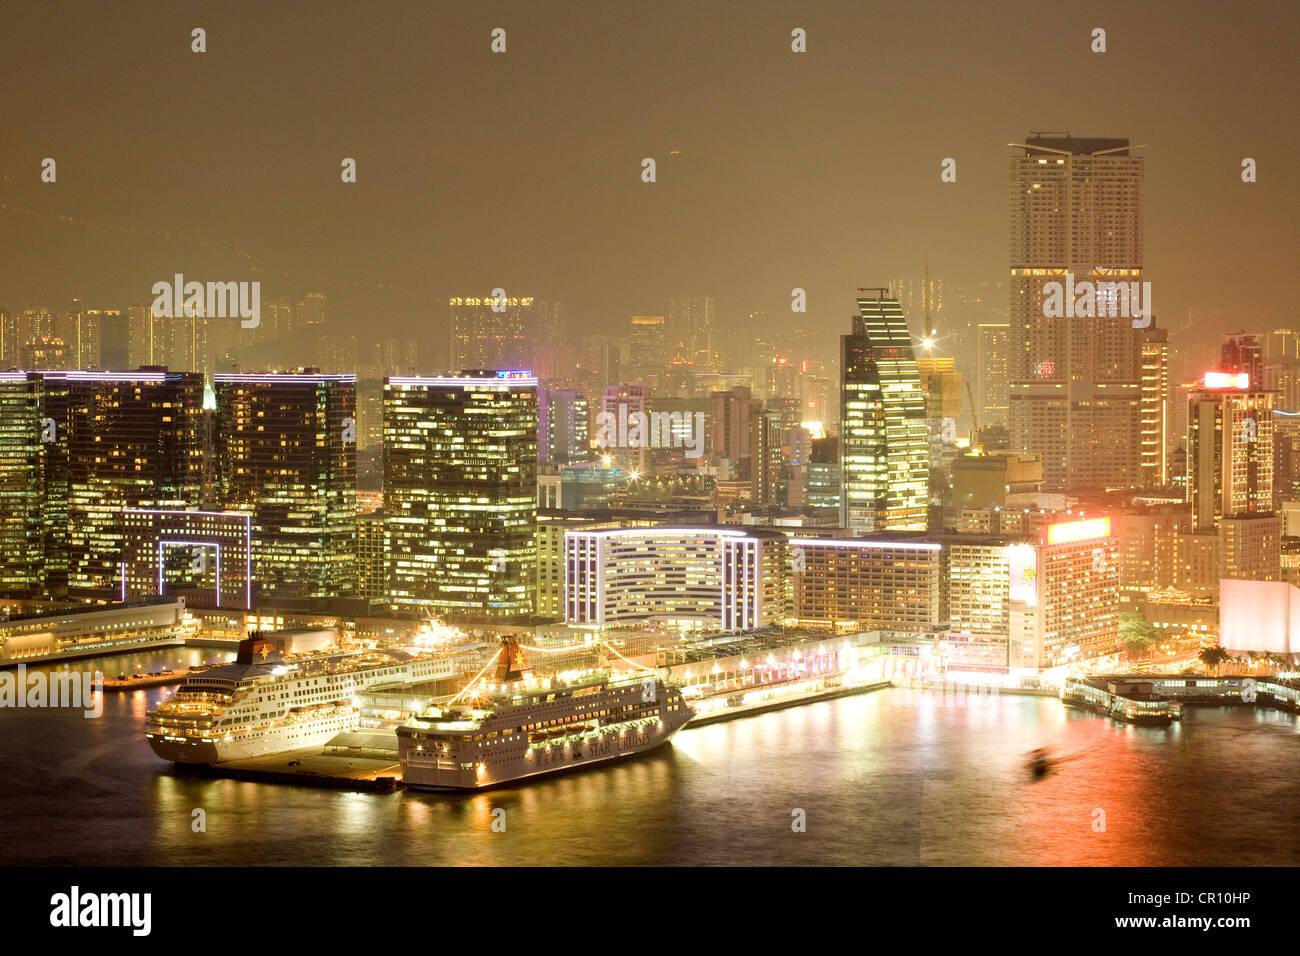 China, Hong Kong, Tsim Sha Tsui, Gateway Blvd, ferries harbour station - Stock Image